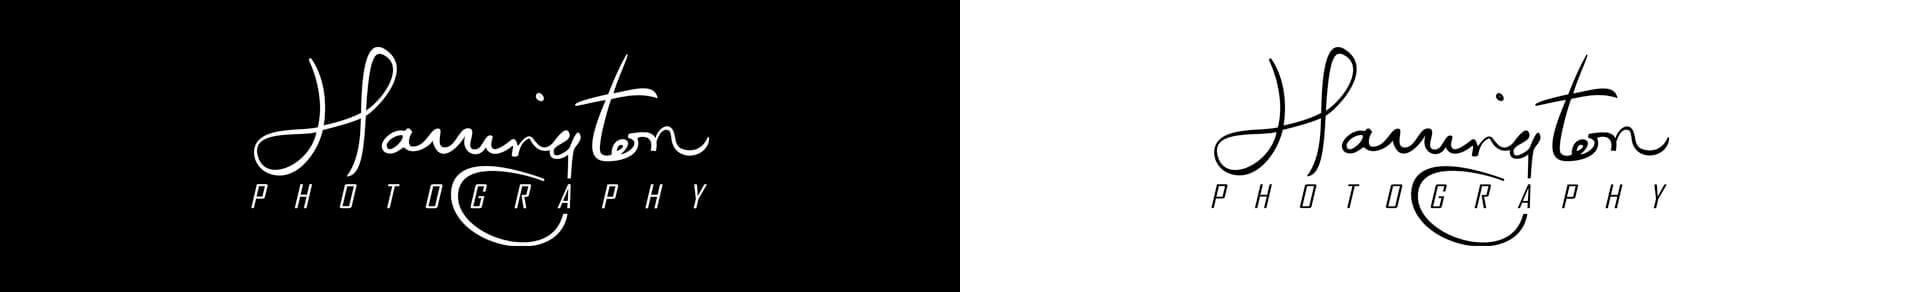 harrington photography black white logo comparison